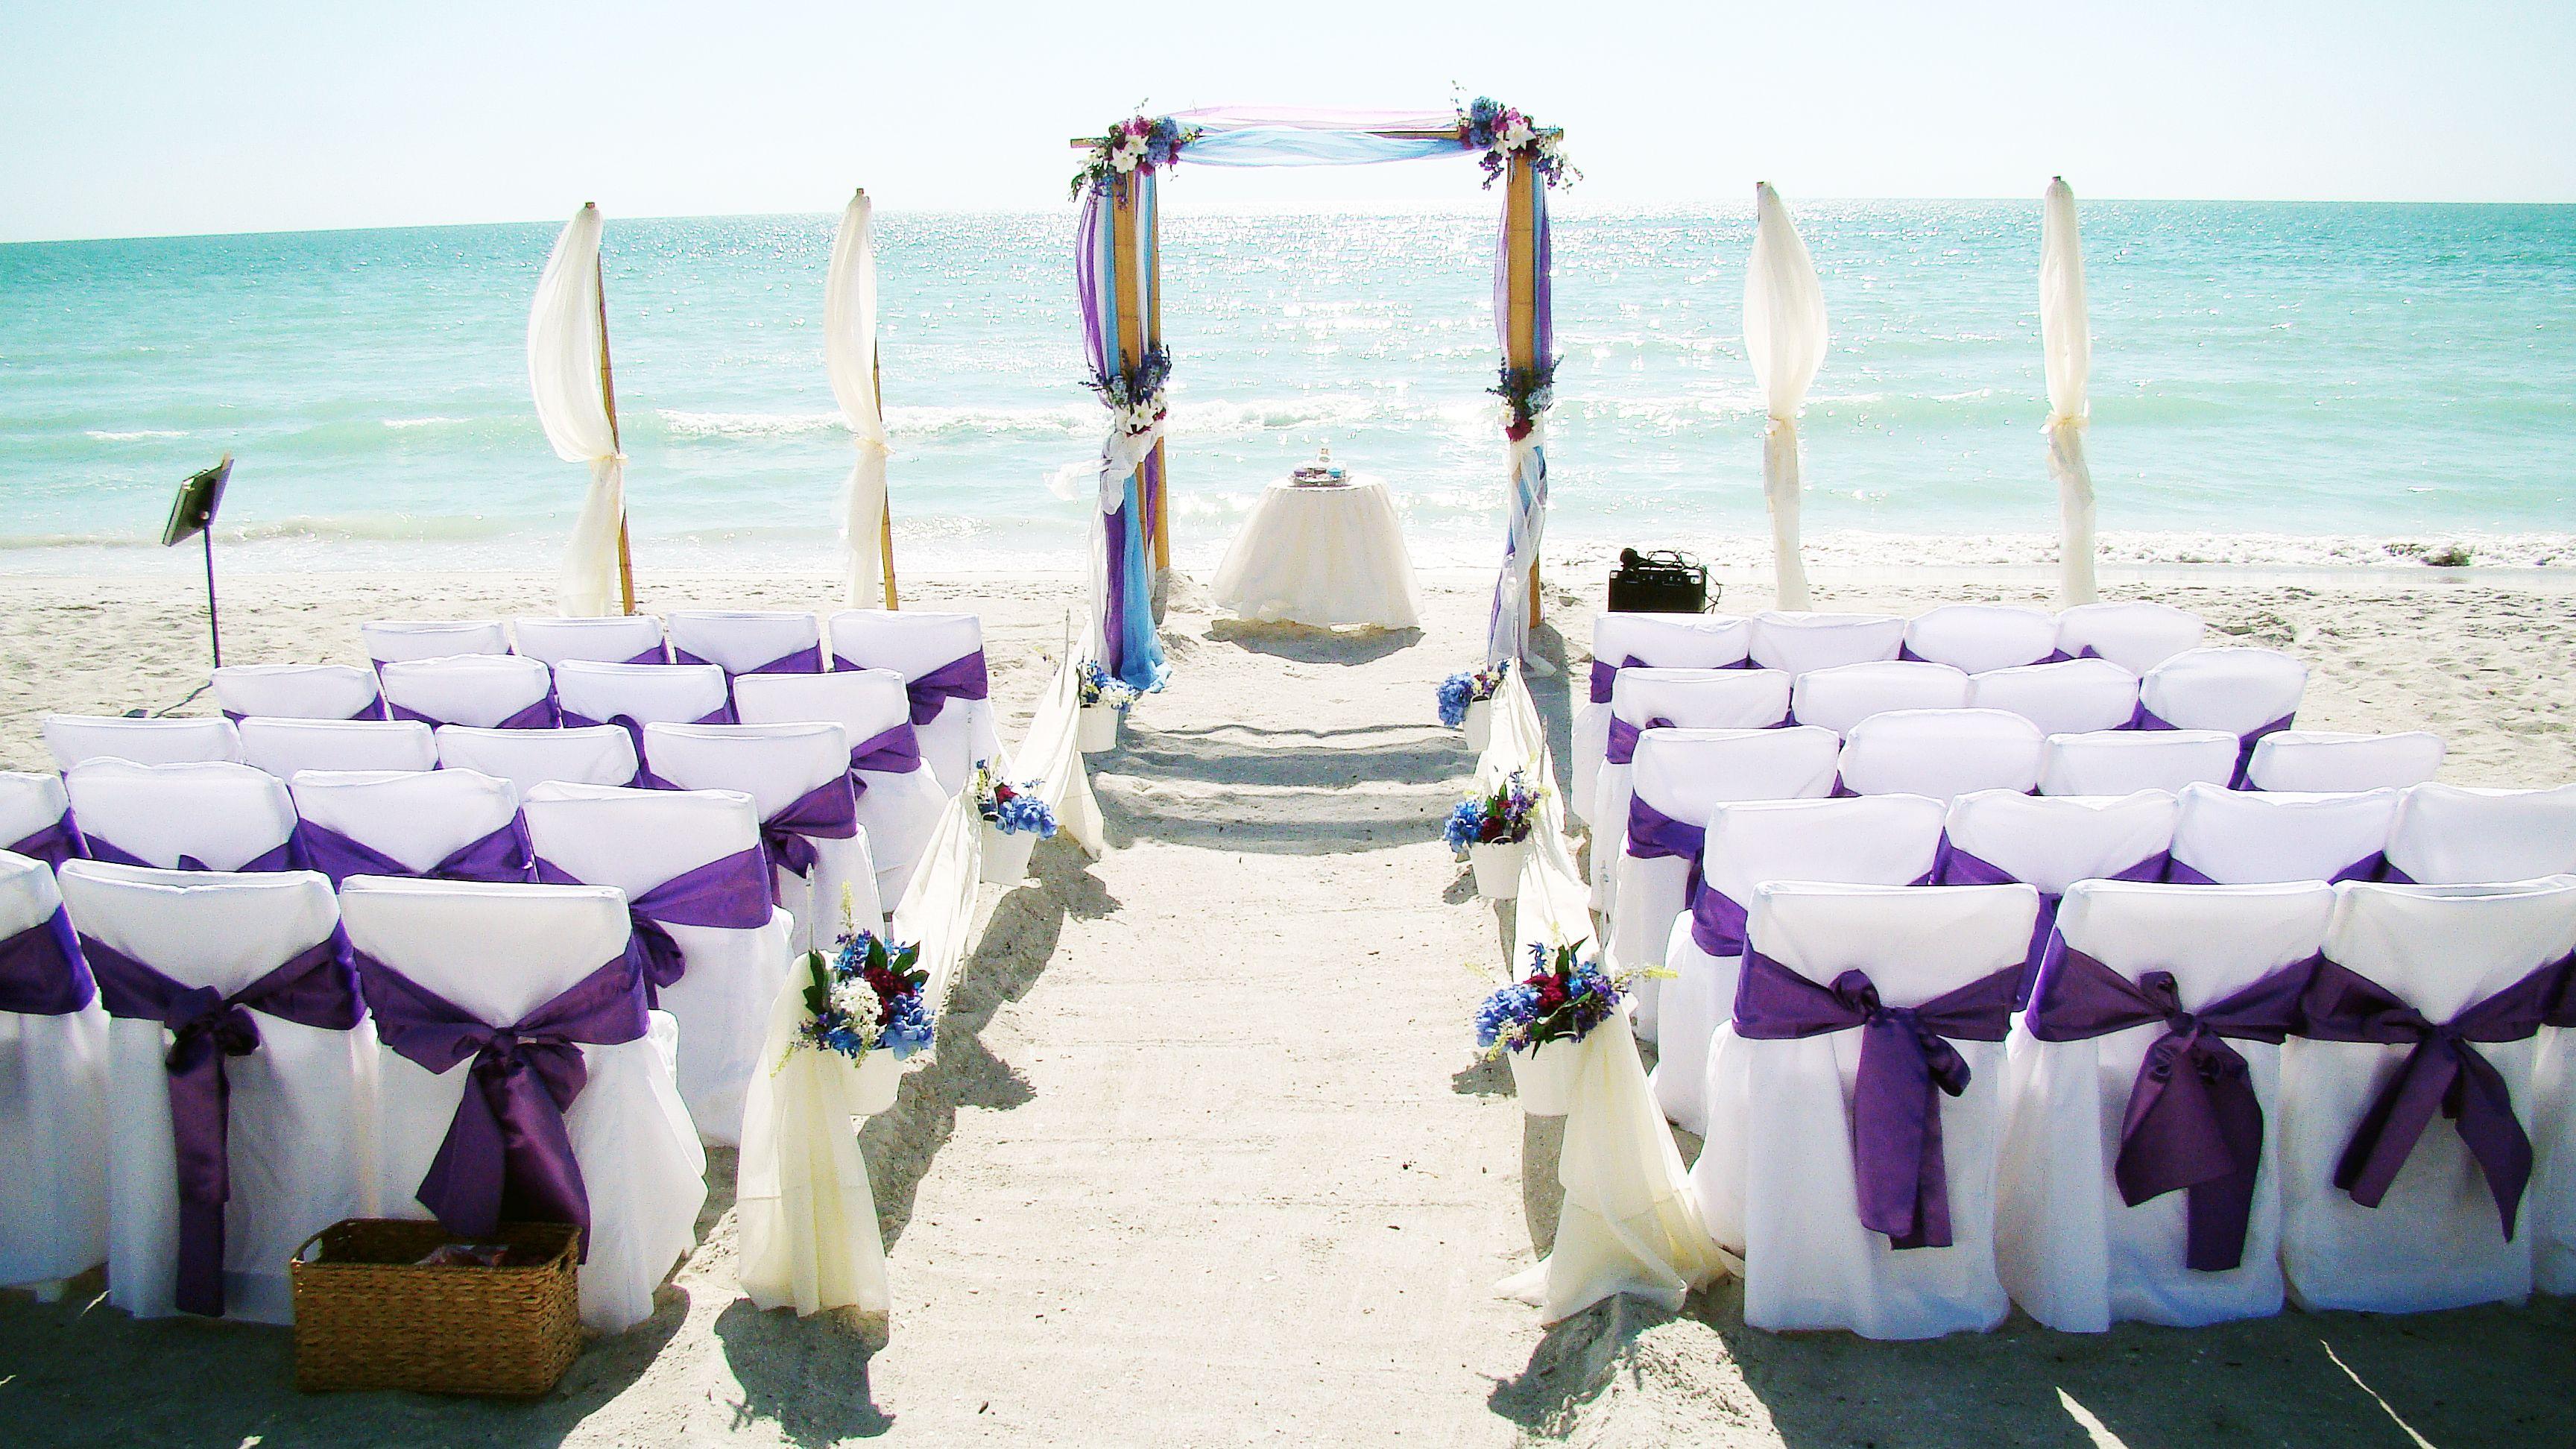 purple beach wedding | beach wedding canopies & chuppas